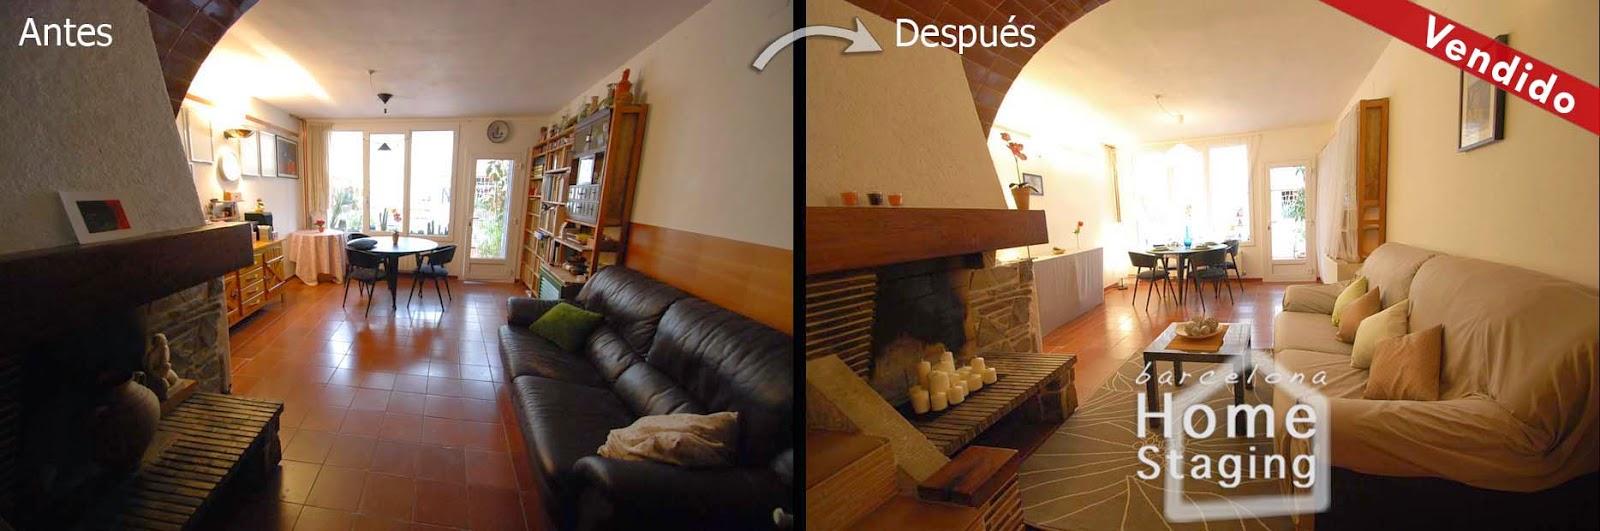 home staying digital viviencad